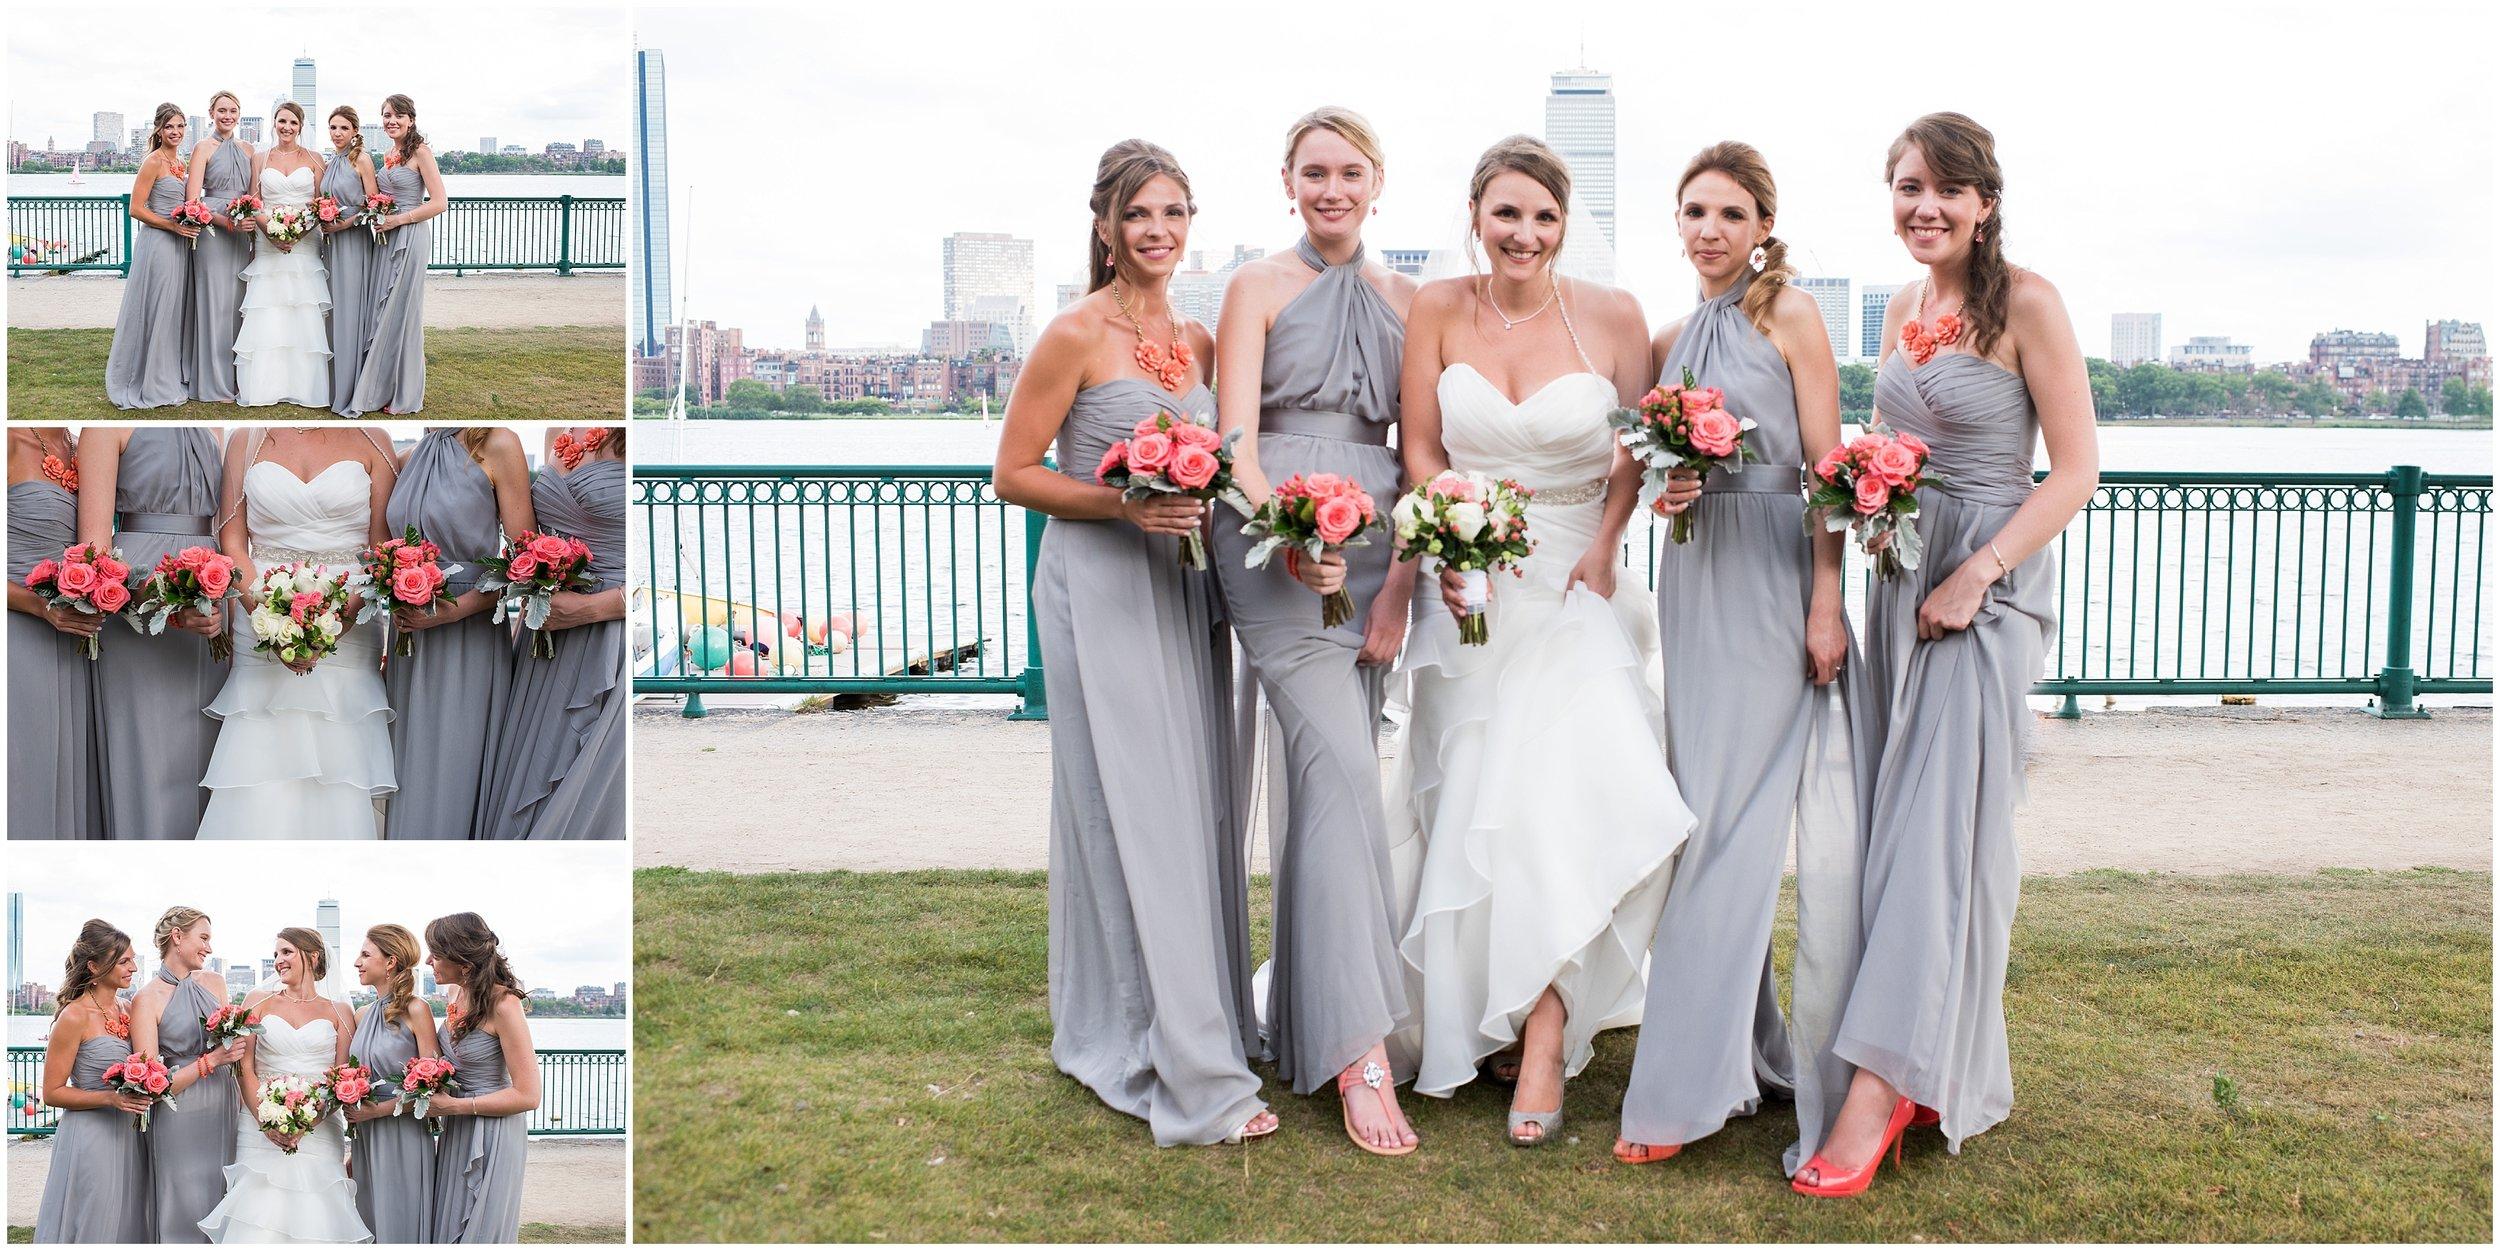 Boston Wedding Photographer, Iryna's Photography. The Bostonian Boston Hotel Wedding Photos,Ceremony at St Cecilia Parish,Wedding Photos, Boston Weddings. Charles River Wedding Photos, Esplanade Wedding Photos.